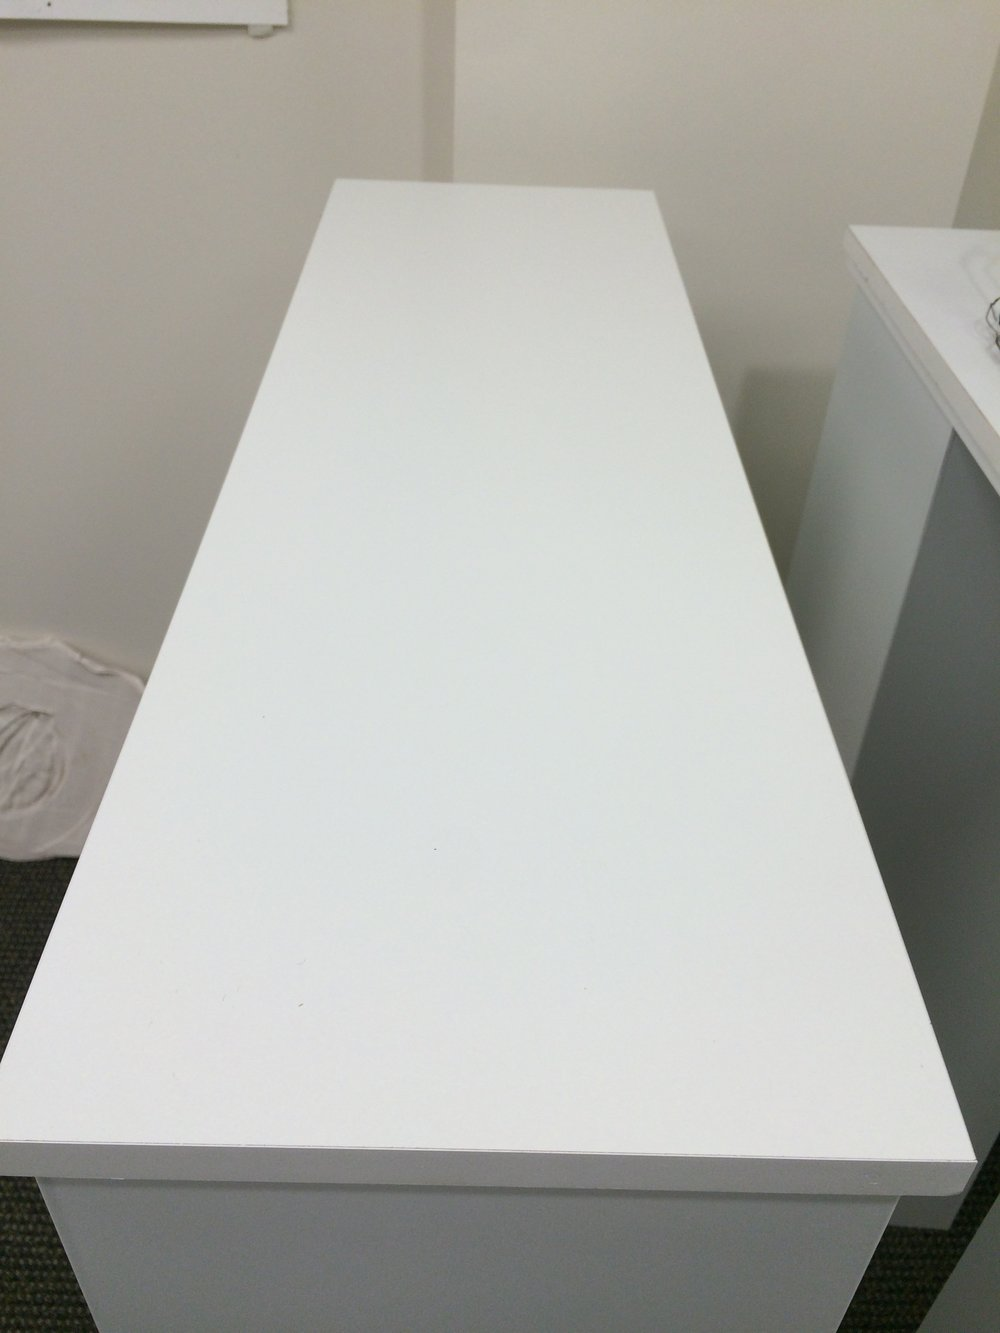 Like a blank canvas